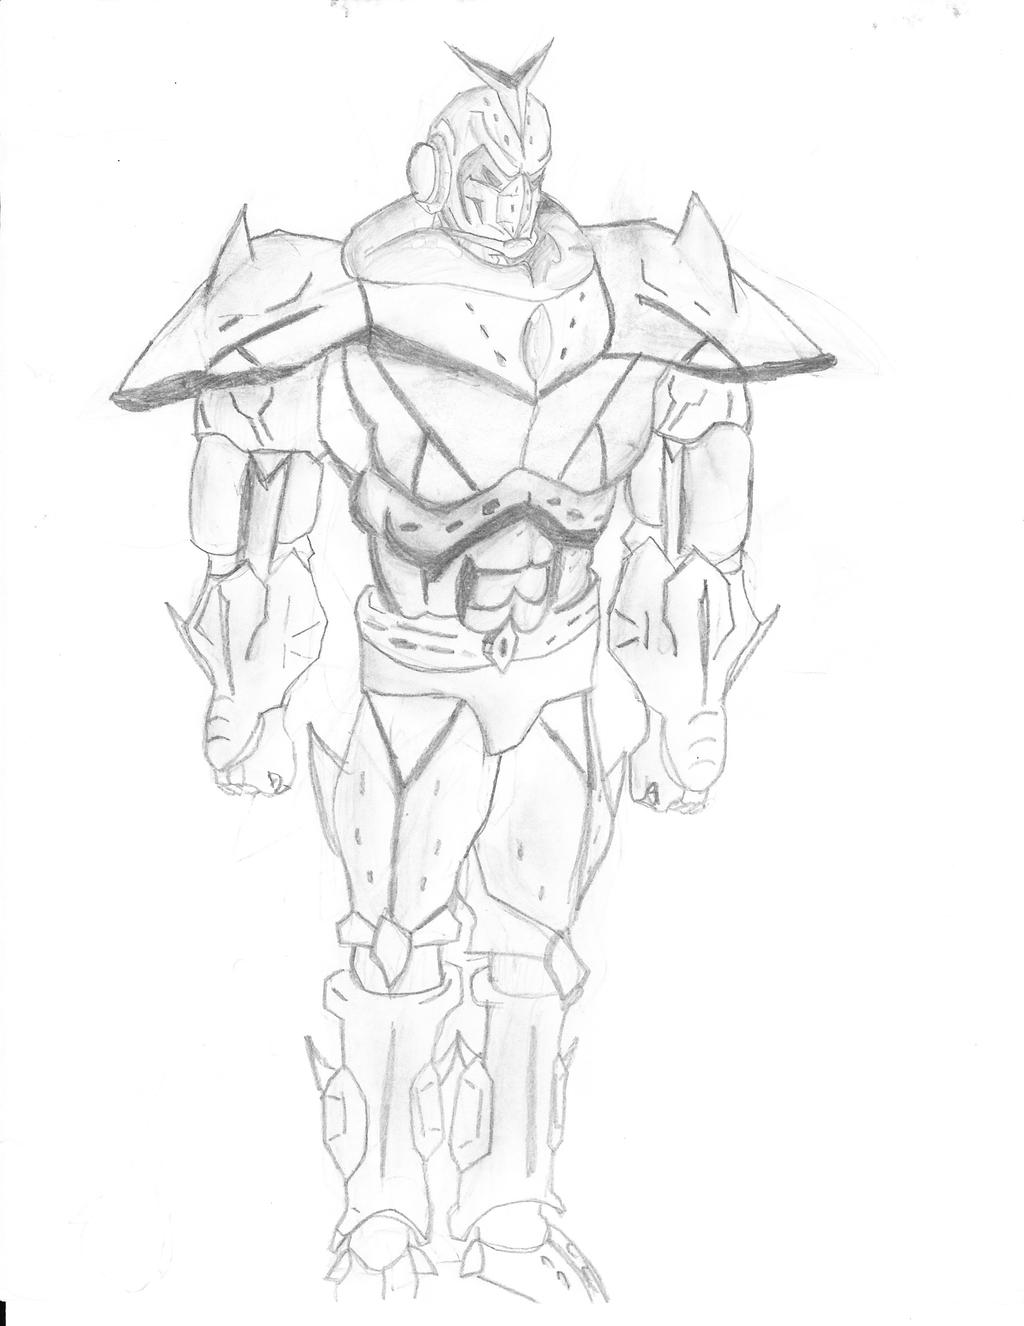 Gundam Sketch by exiled117